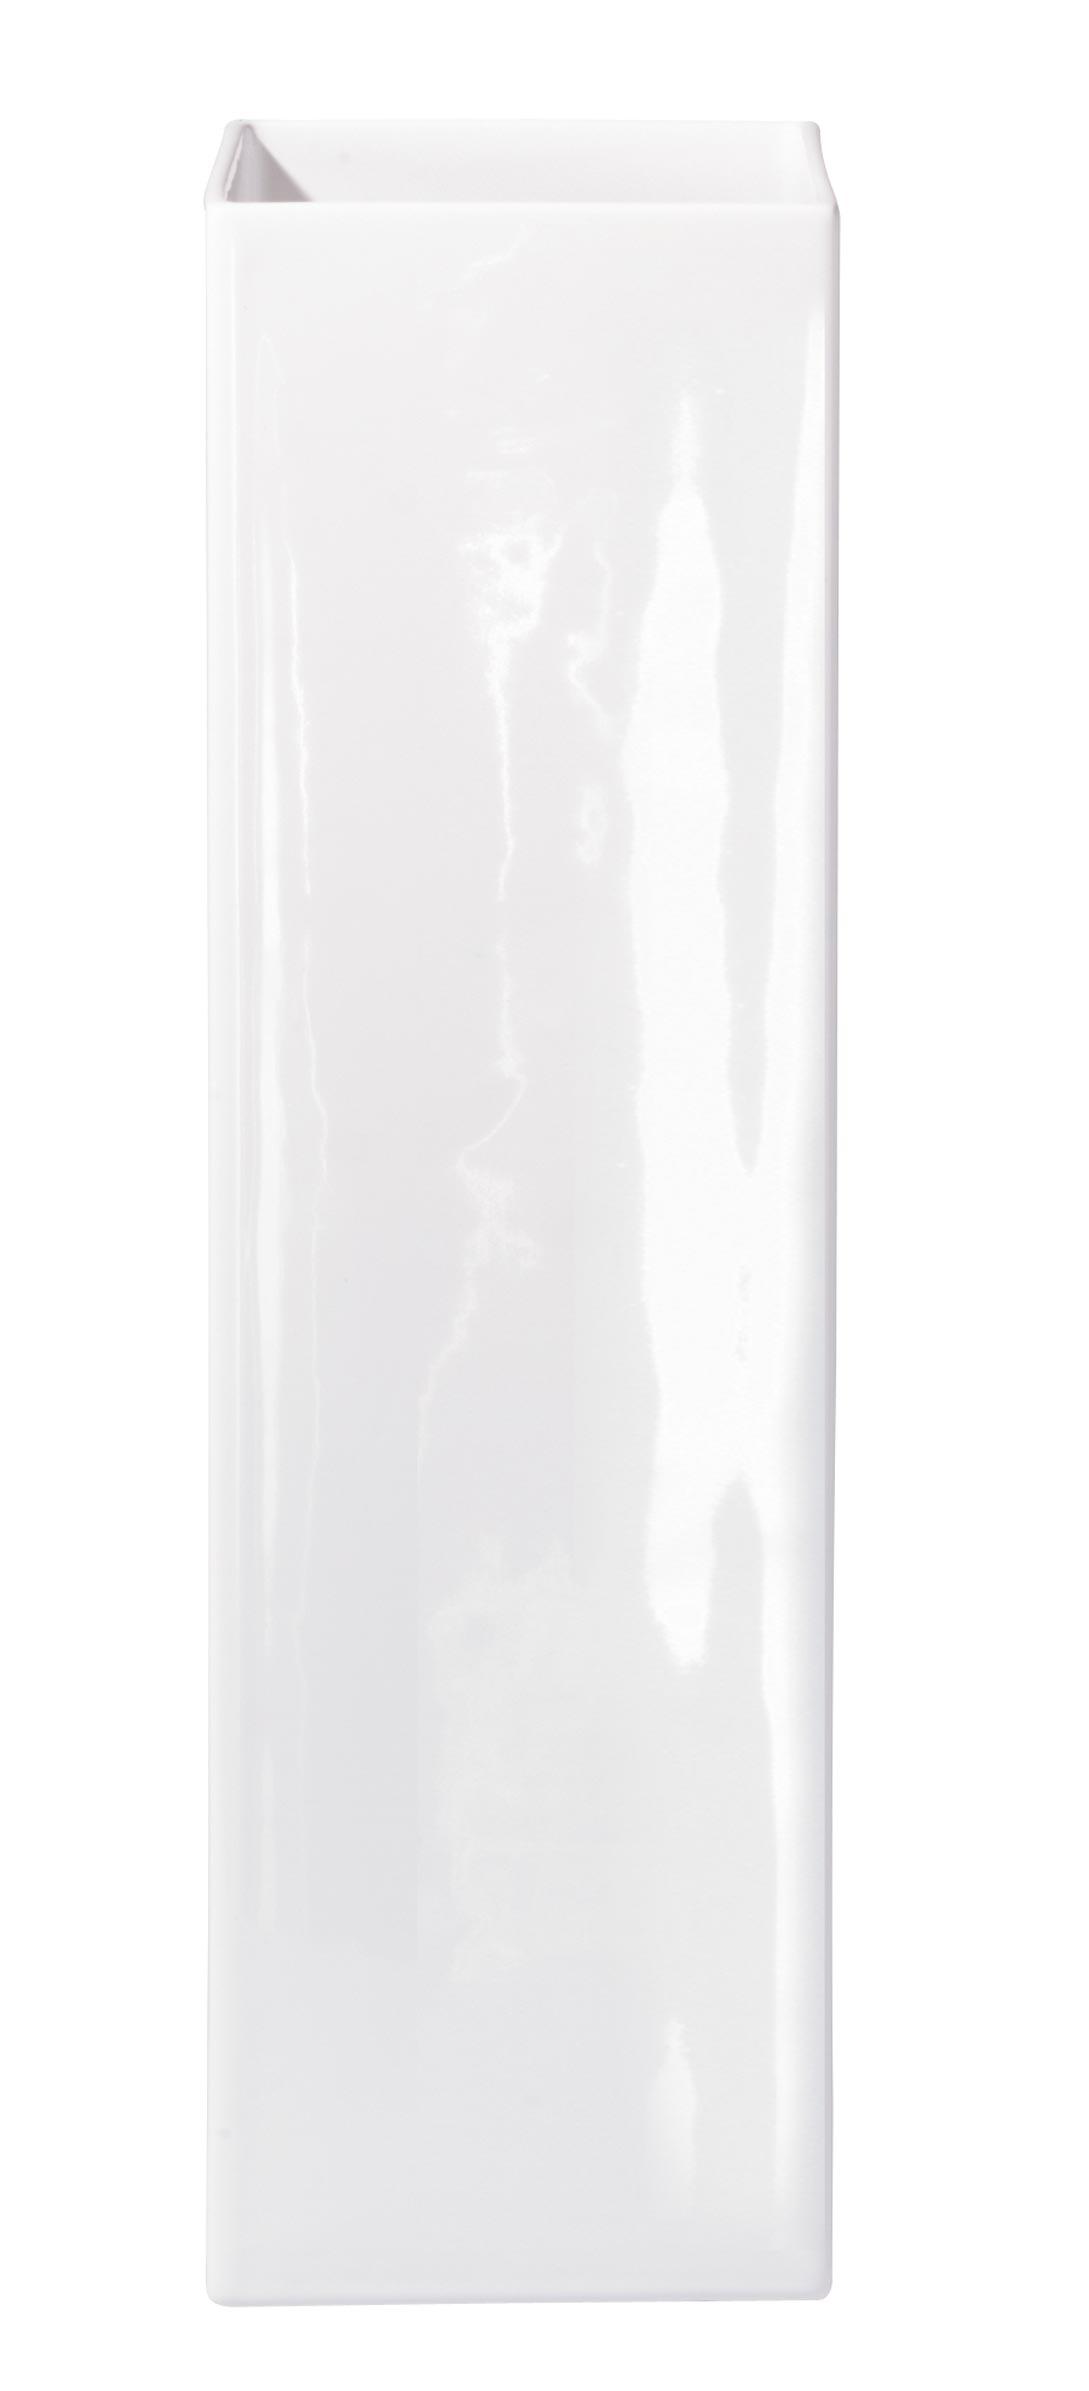 vase wei vasen vasen bert pfe produkte home by asa die asa selection wohnwelten. Black Bedroom Furniture Sets. Home Design Ideas